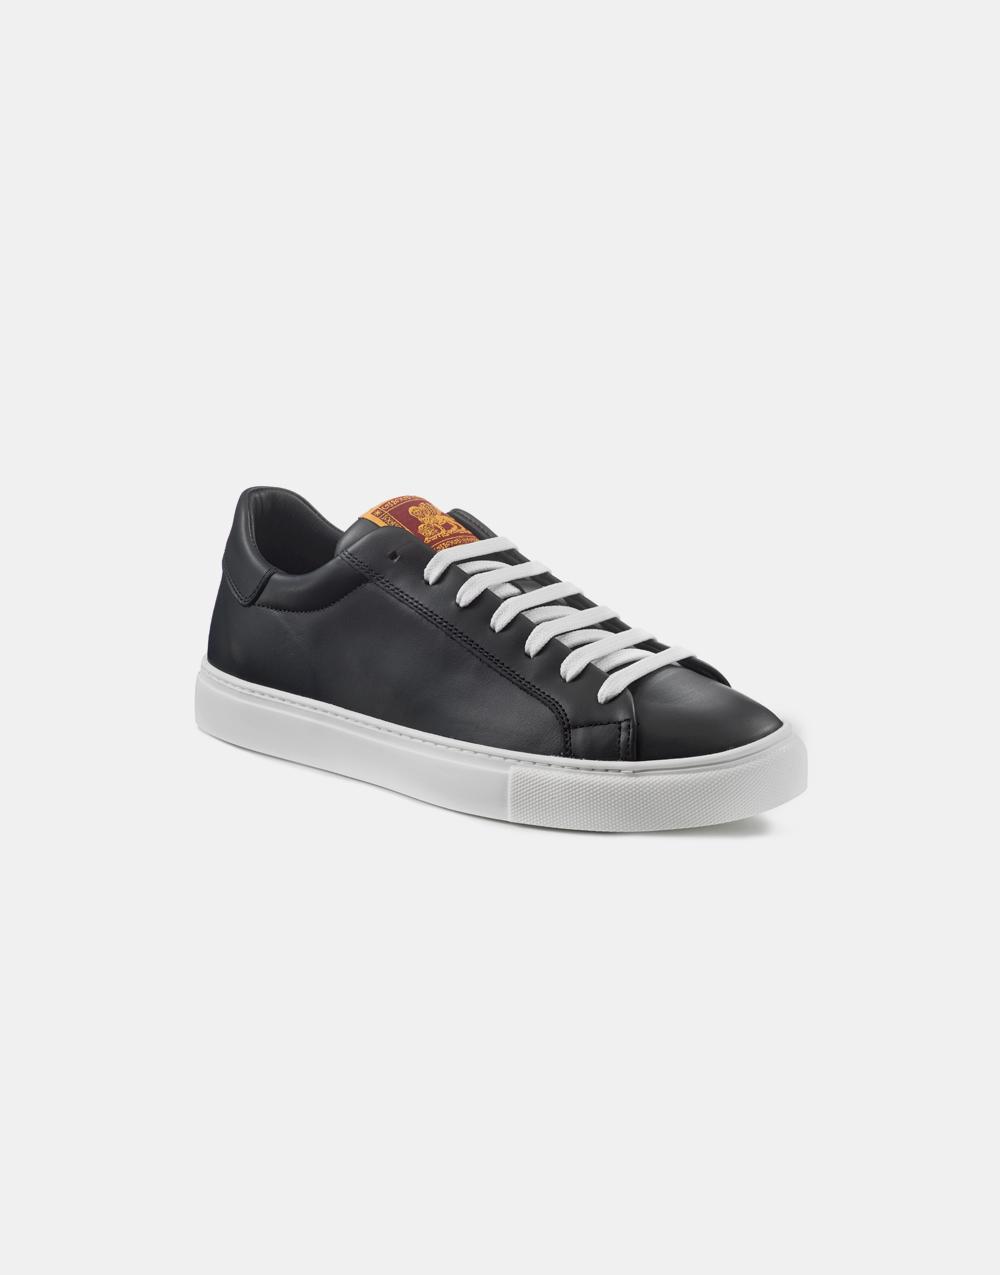 sneakers-veneto-doc-nera-bassa